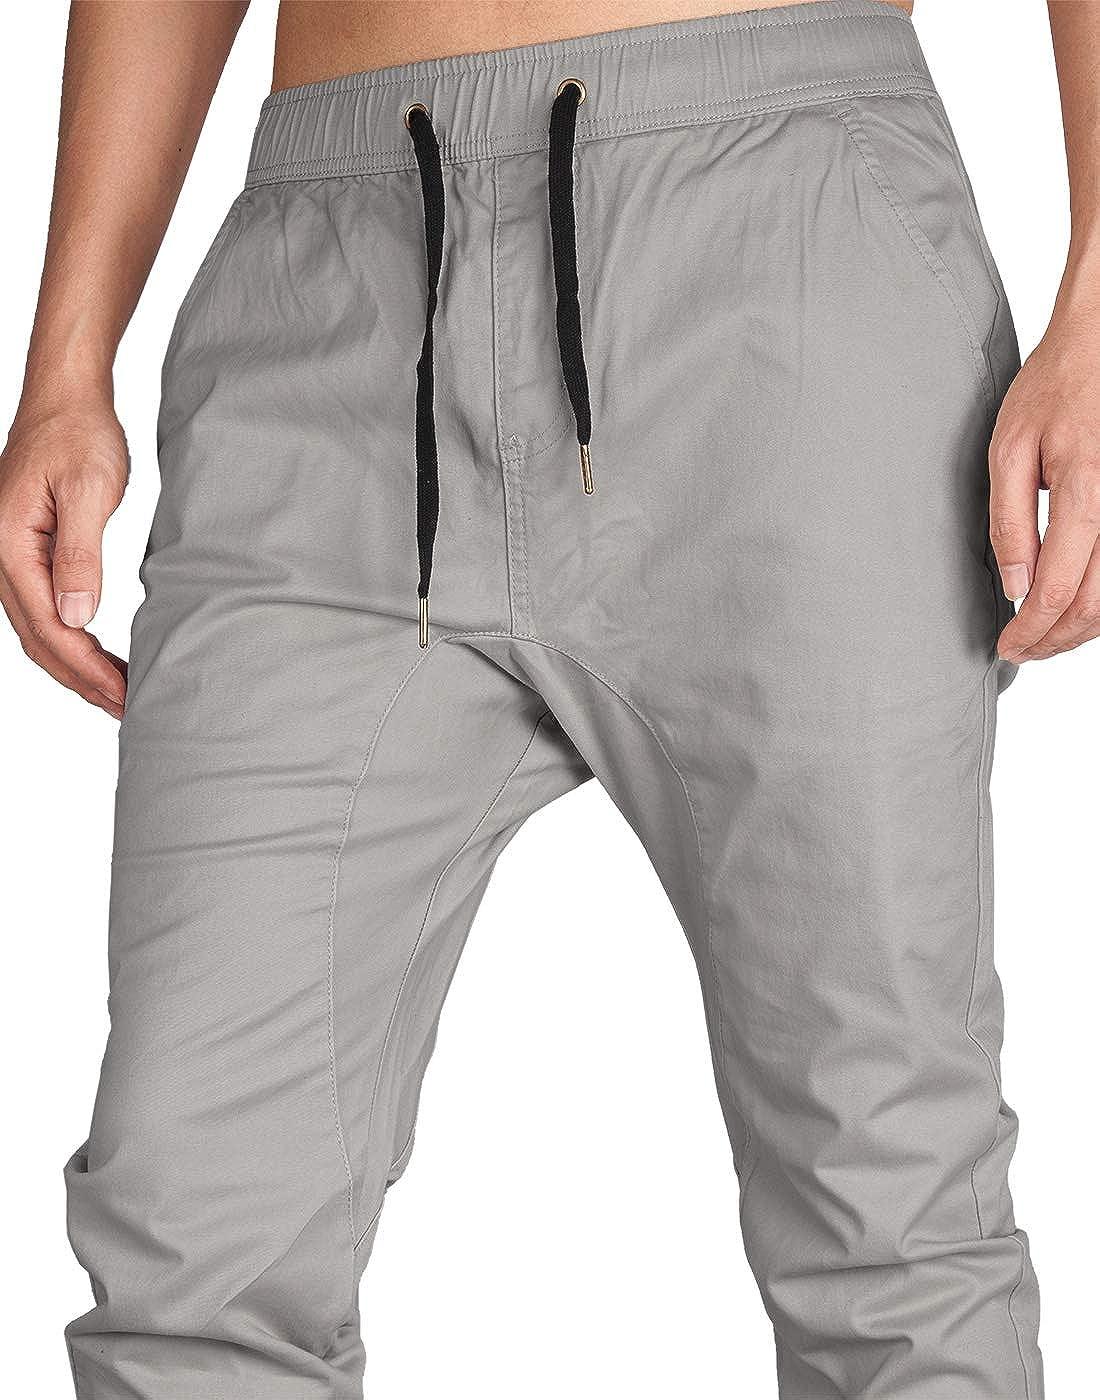 ITALY MORN Pantal/ón Jogger Slim Fit para Hombre Casual Chino Jogging Algod/ón